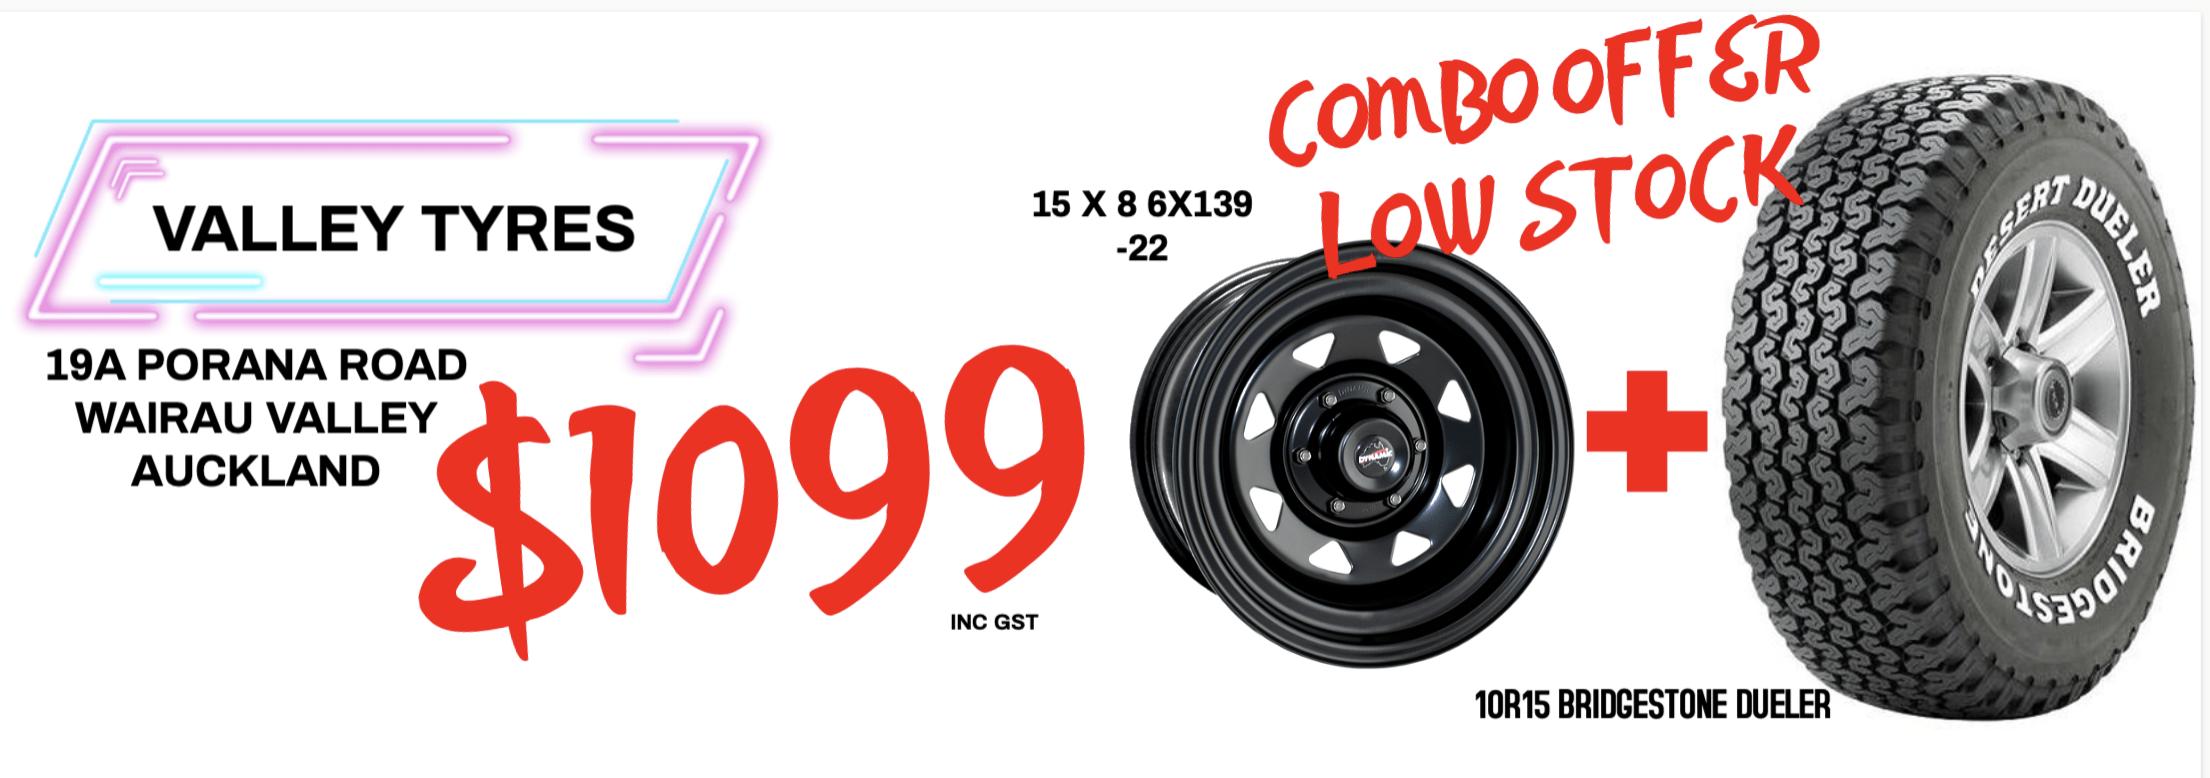 Bridgestone wheel and Tyre - Valley Wheel & Tyre Service